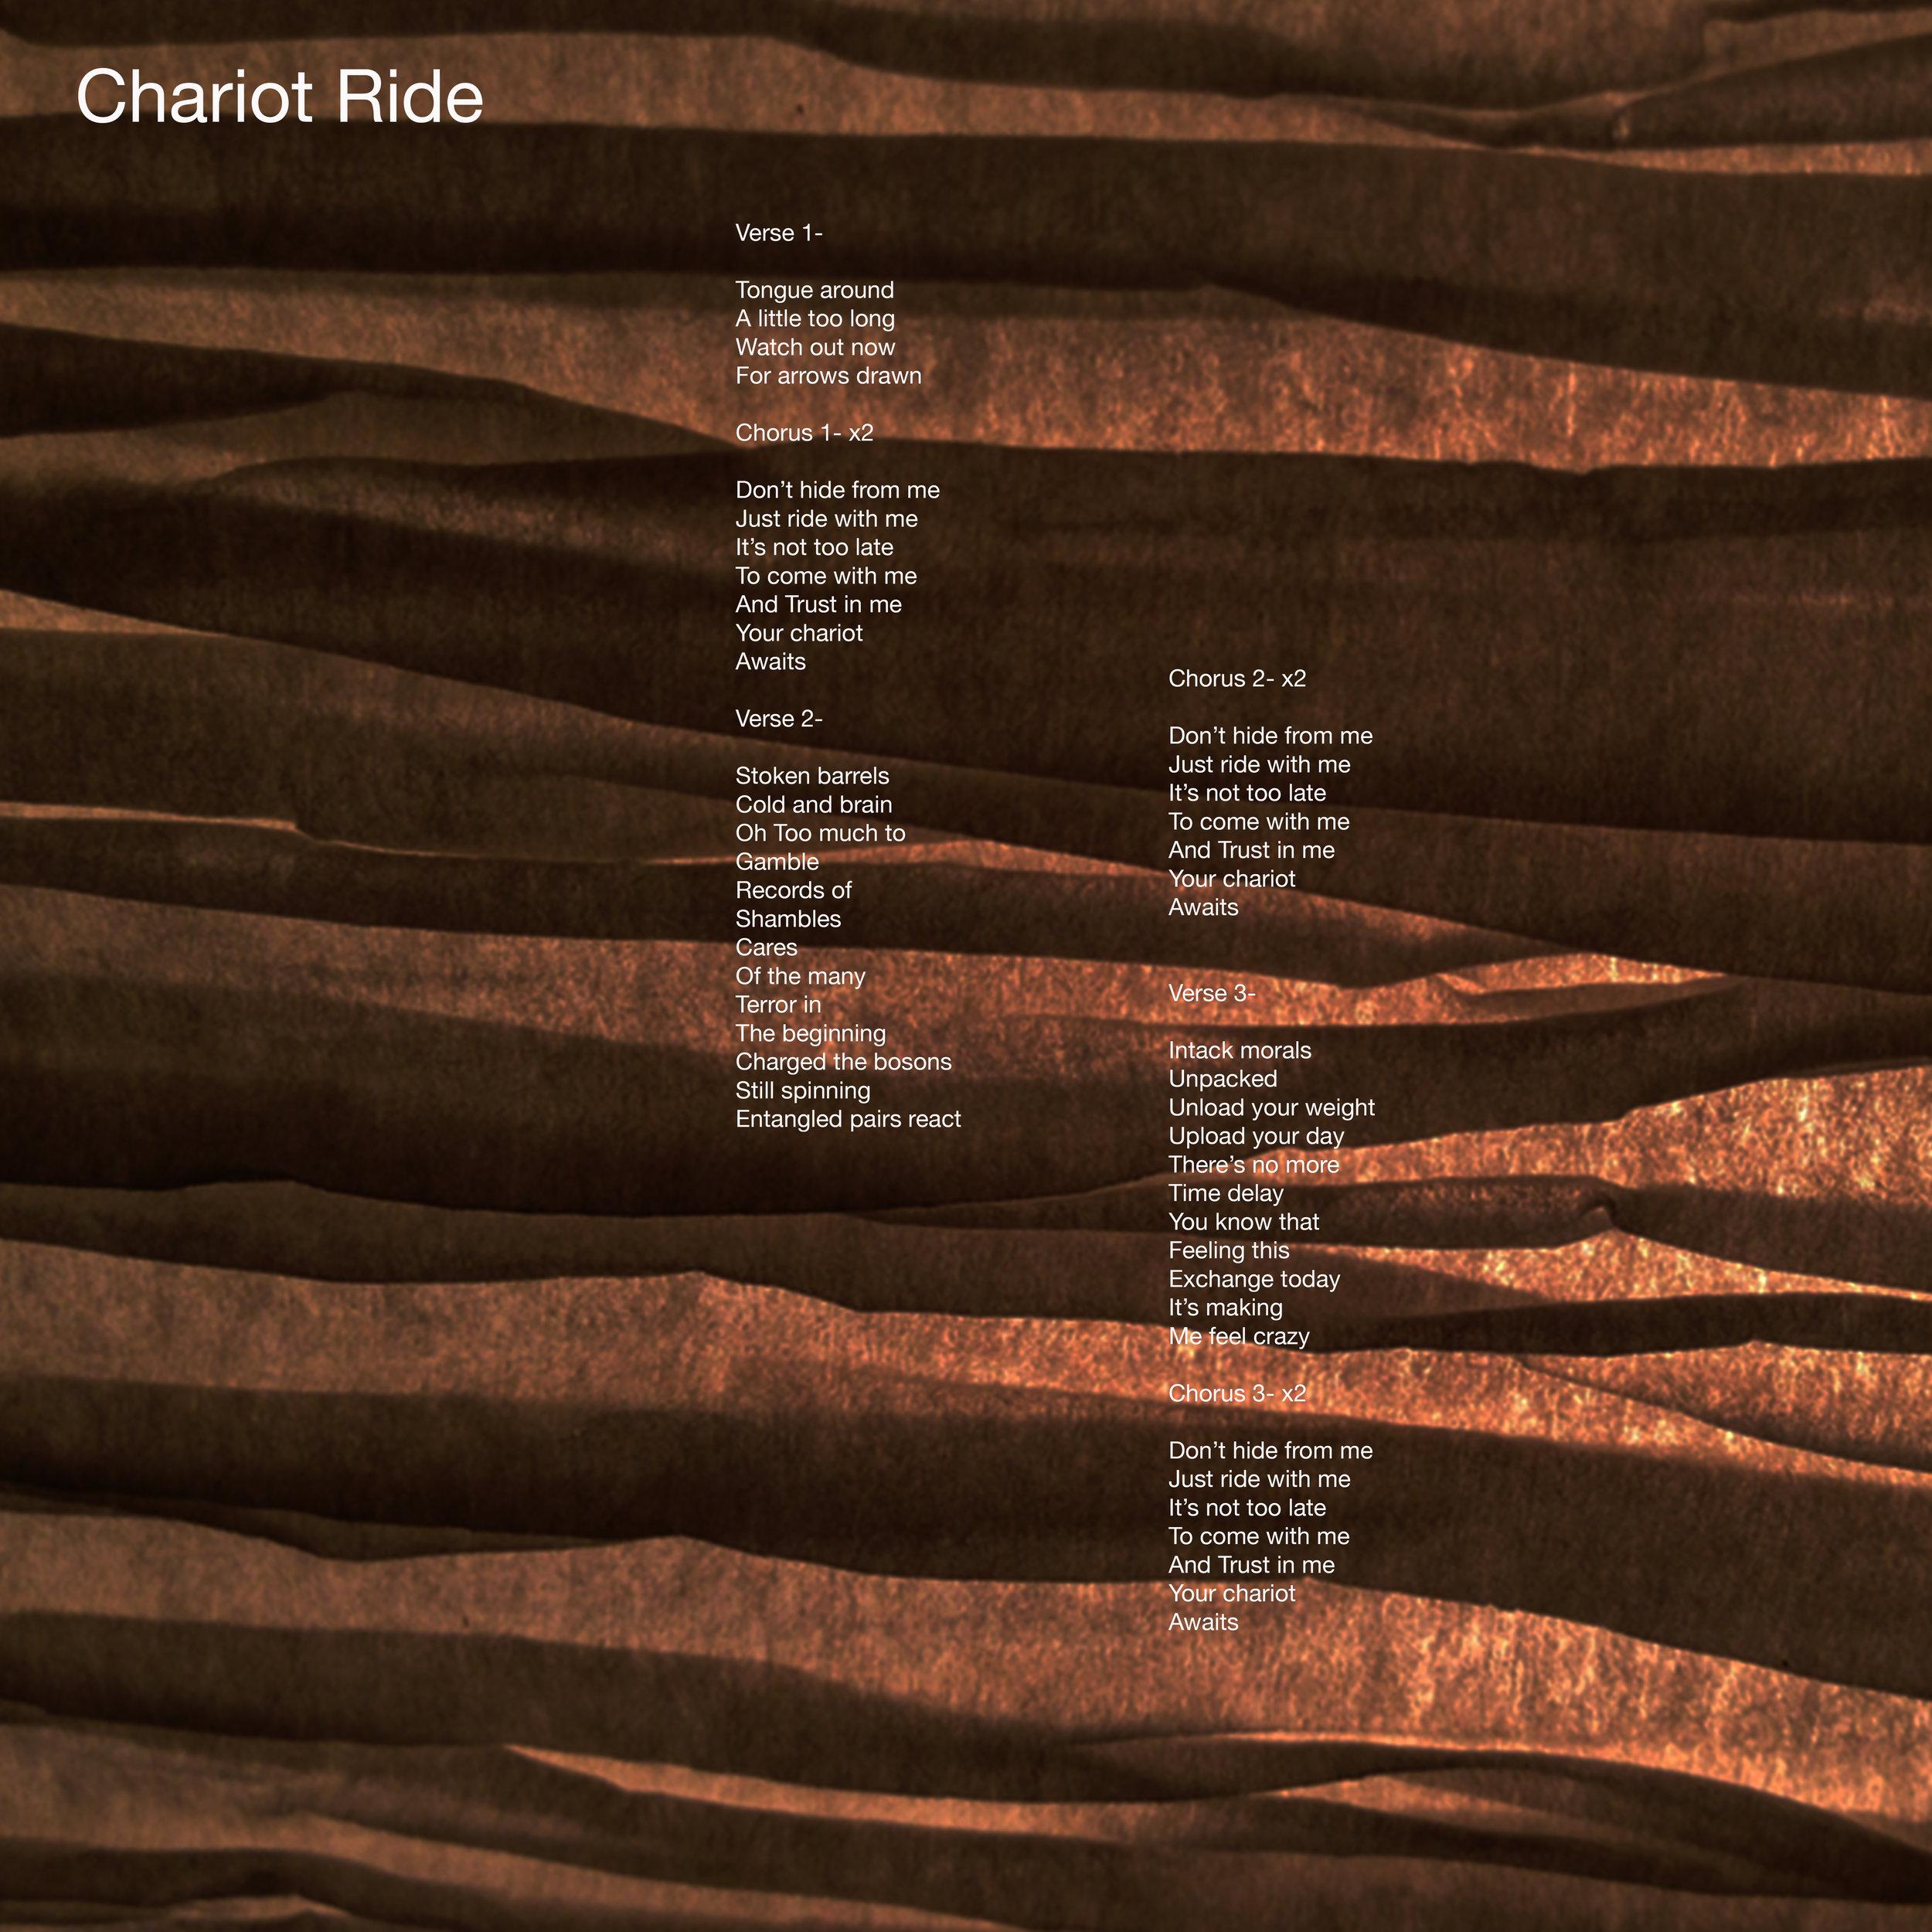 ChariotRideLyricArtDLX.jpg